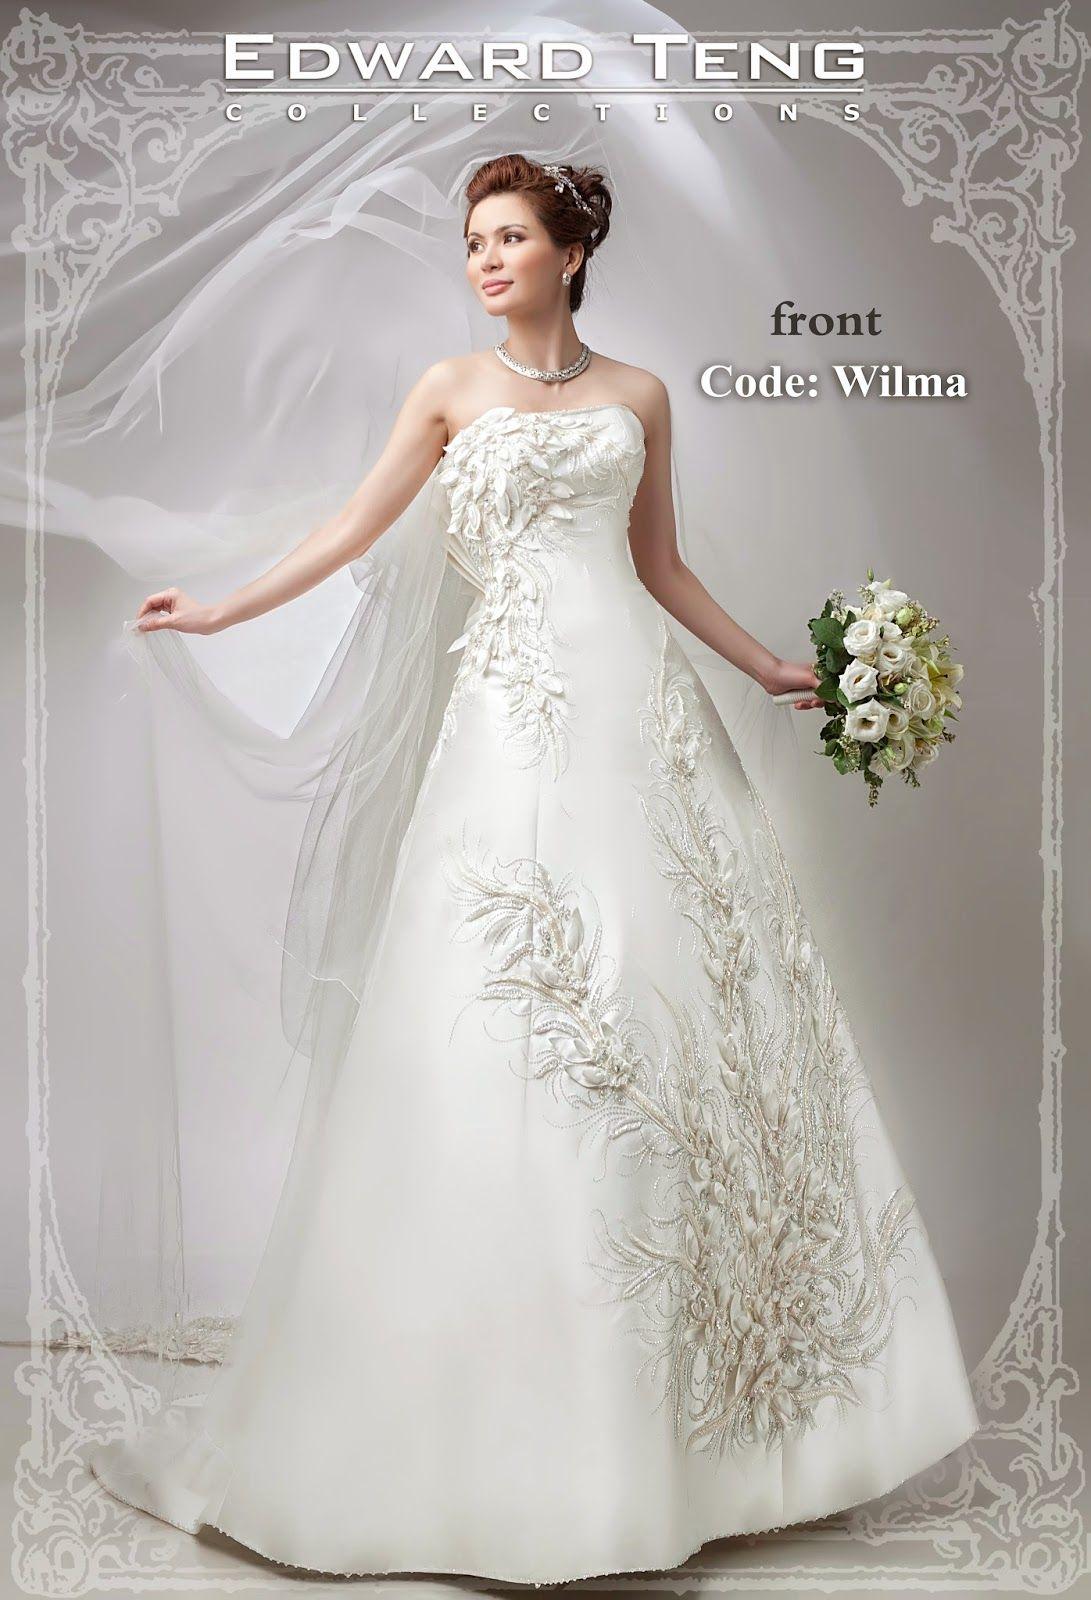 Edward Teng - Philippine Bridal Gowns | Wedding Gown | Pinterest ...